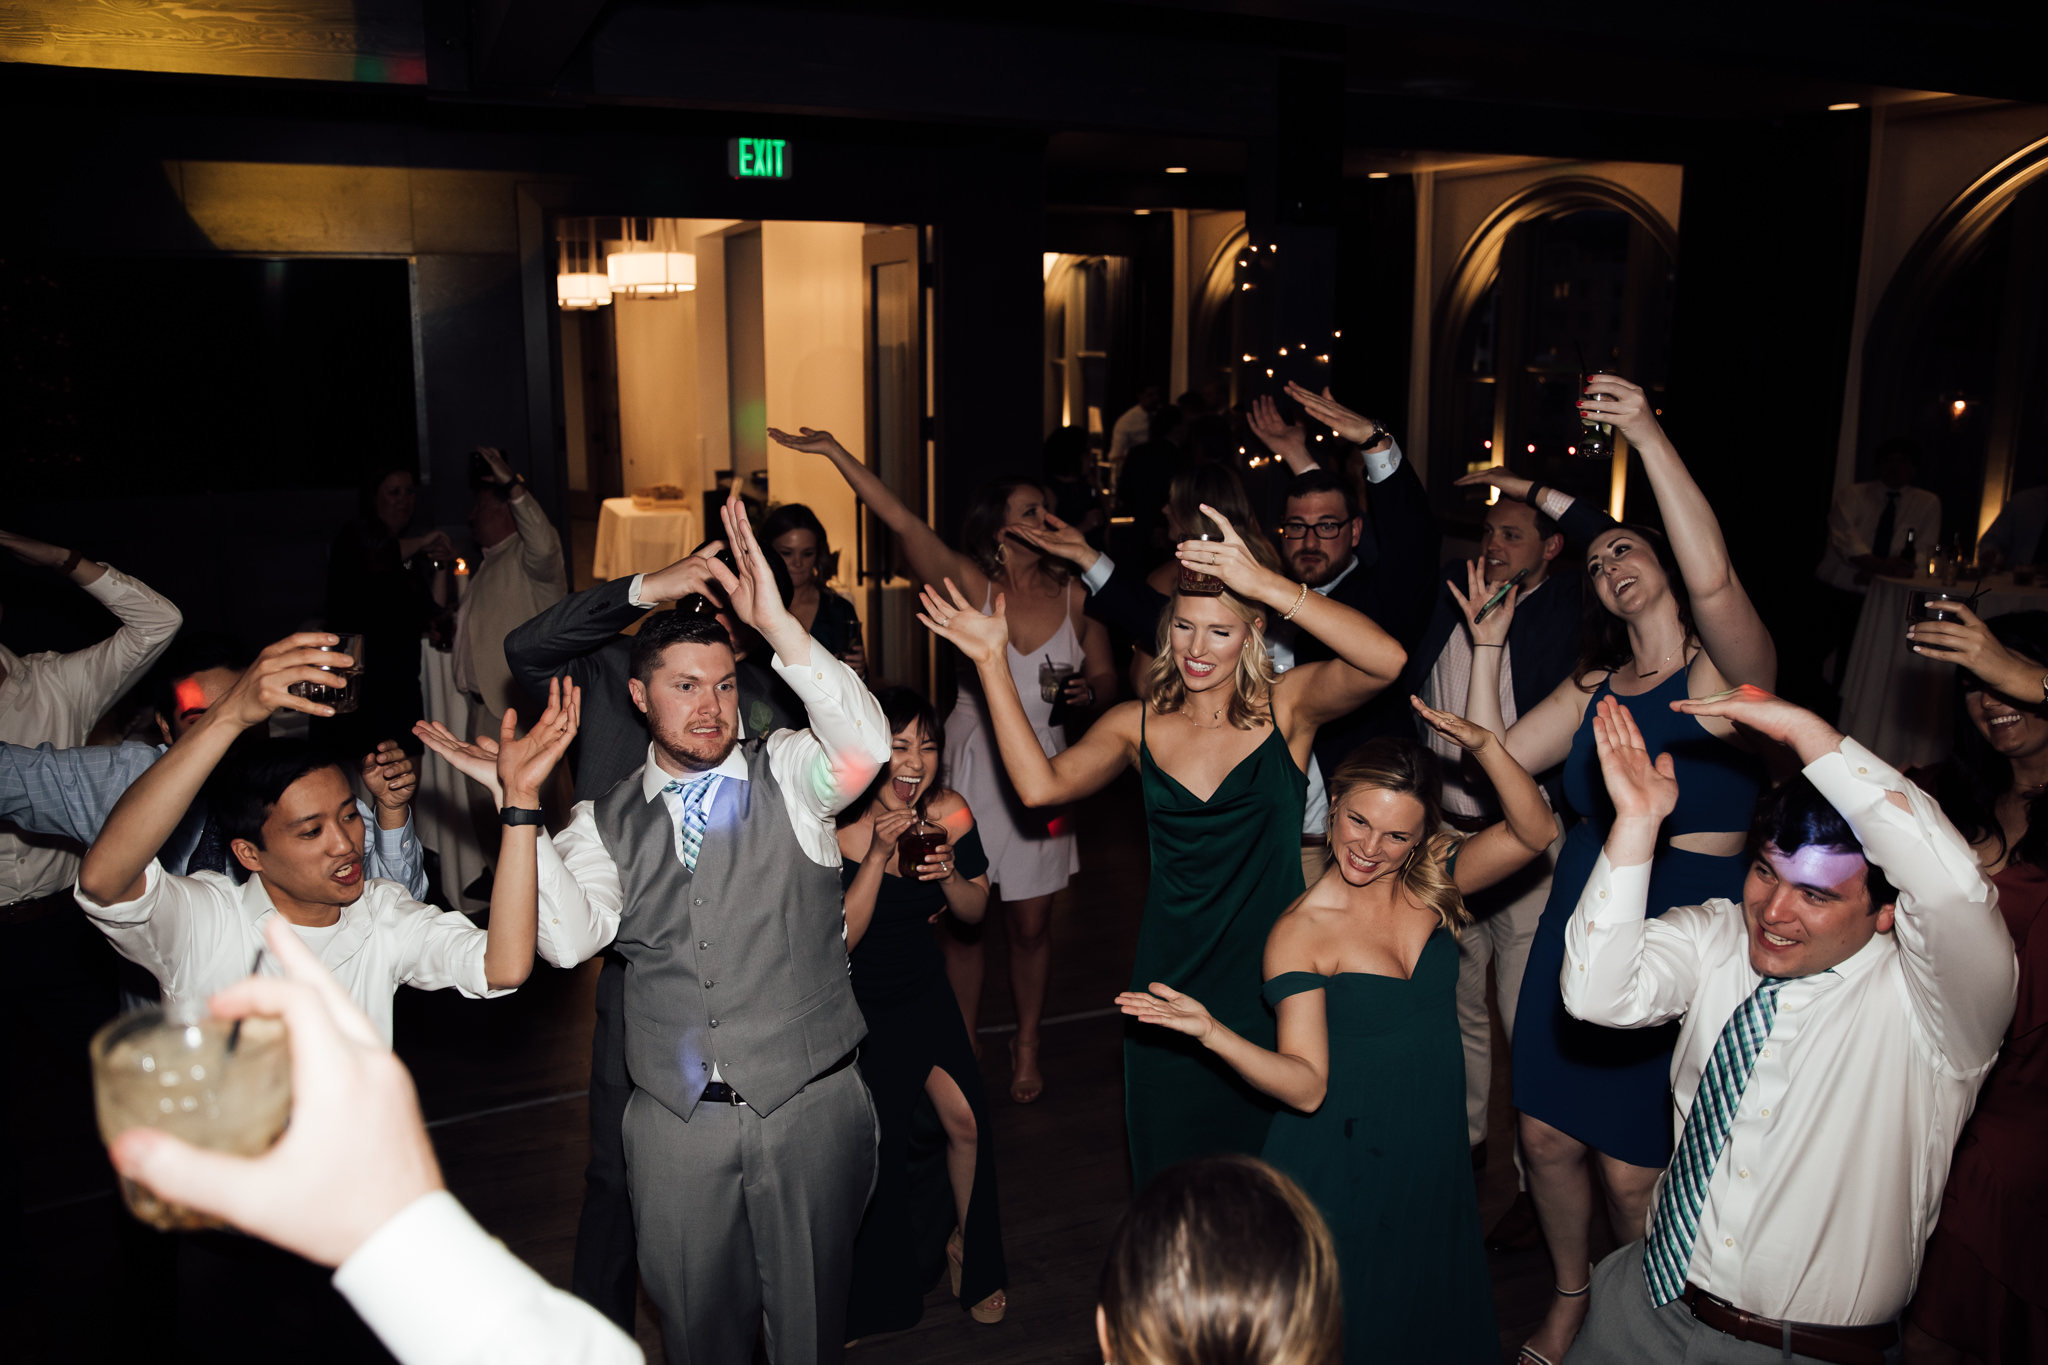 phantom-canyon-brewery-colorado-springs-wedding-photographer-14.jpg